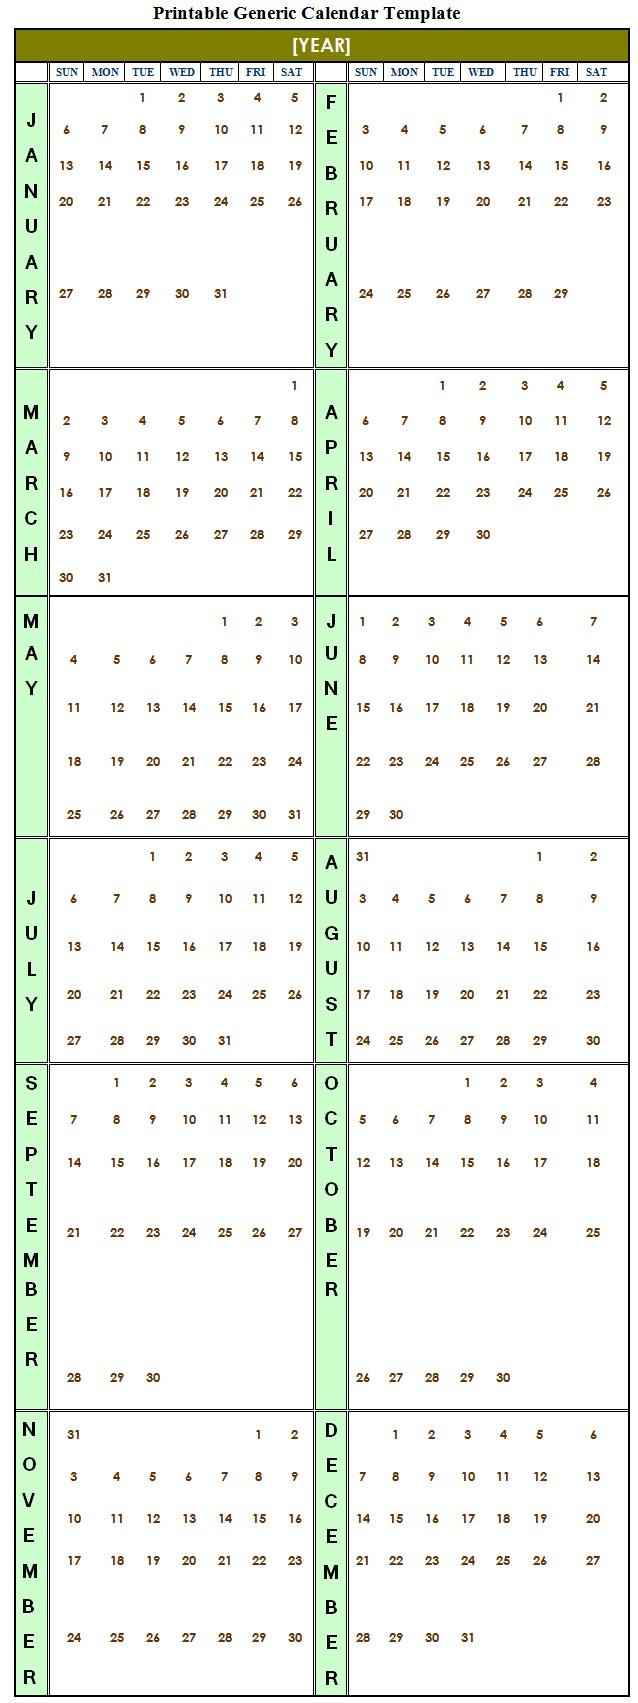 Printable Generic Calendar Template